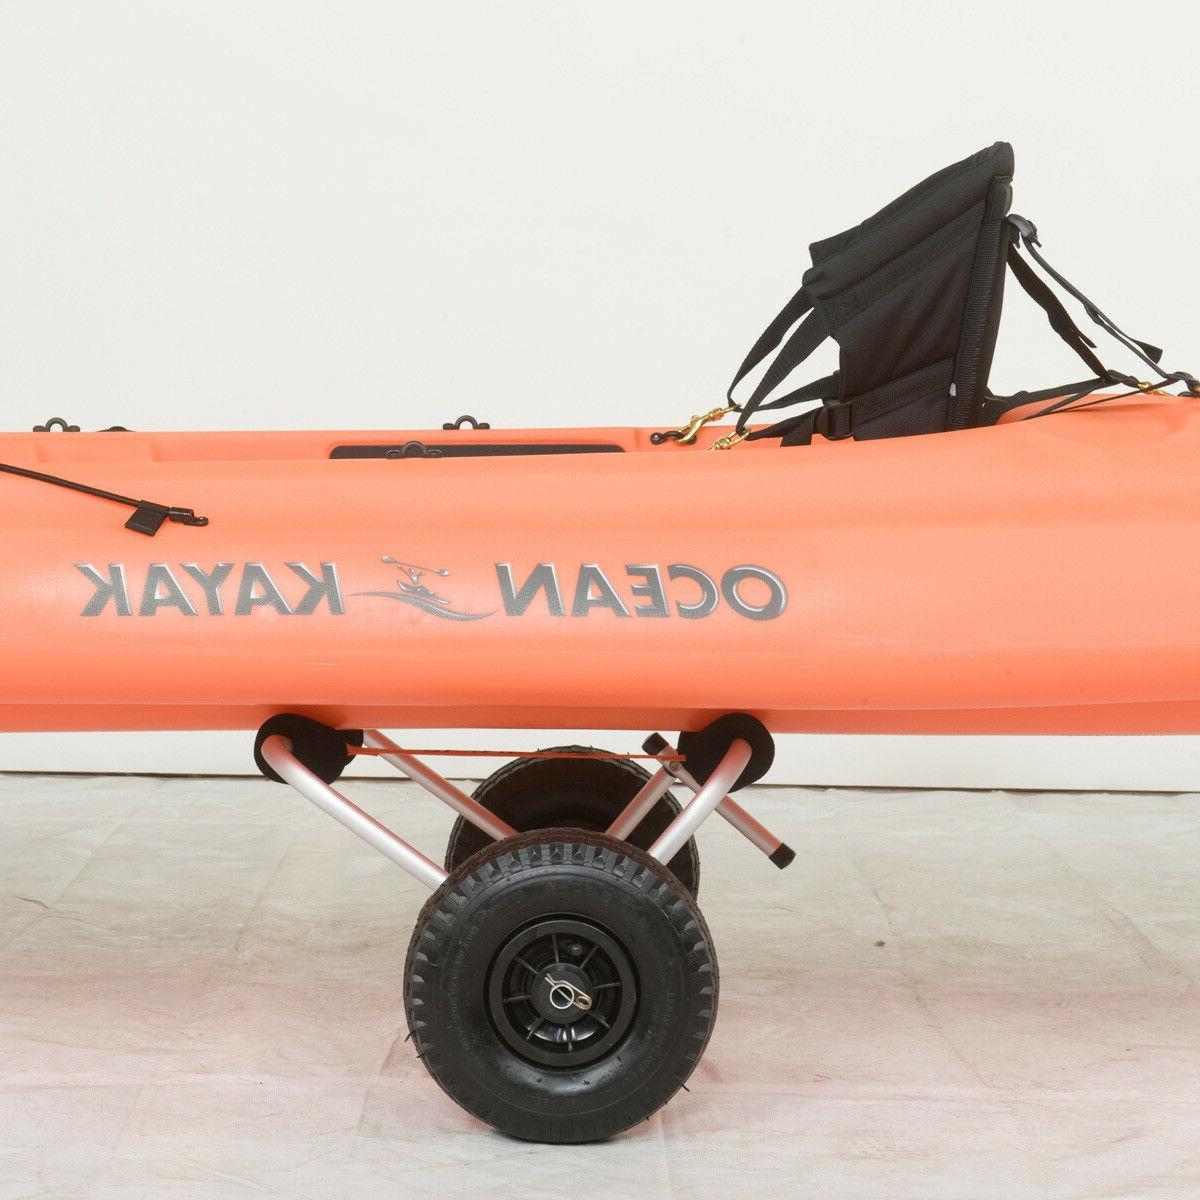 New Canoe Canoe/Kayak Cart With